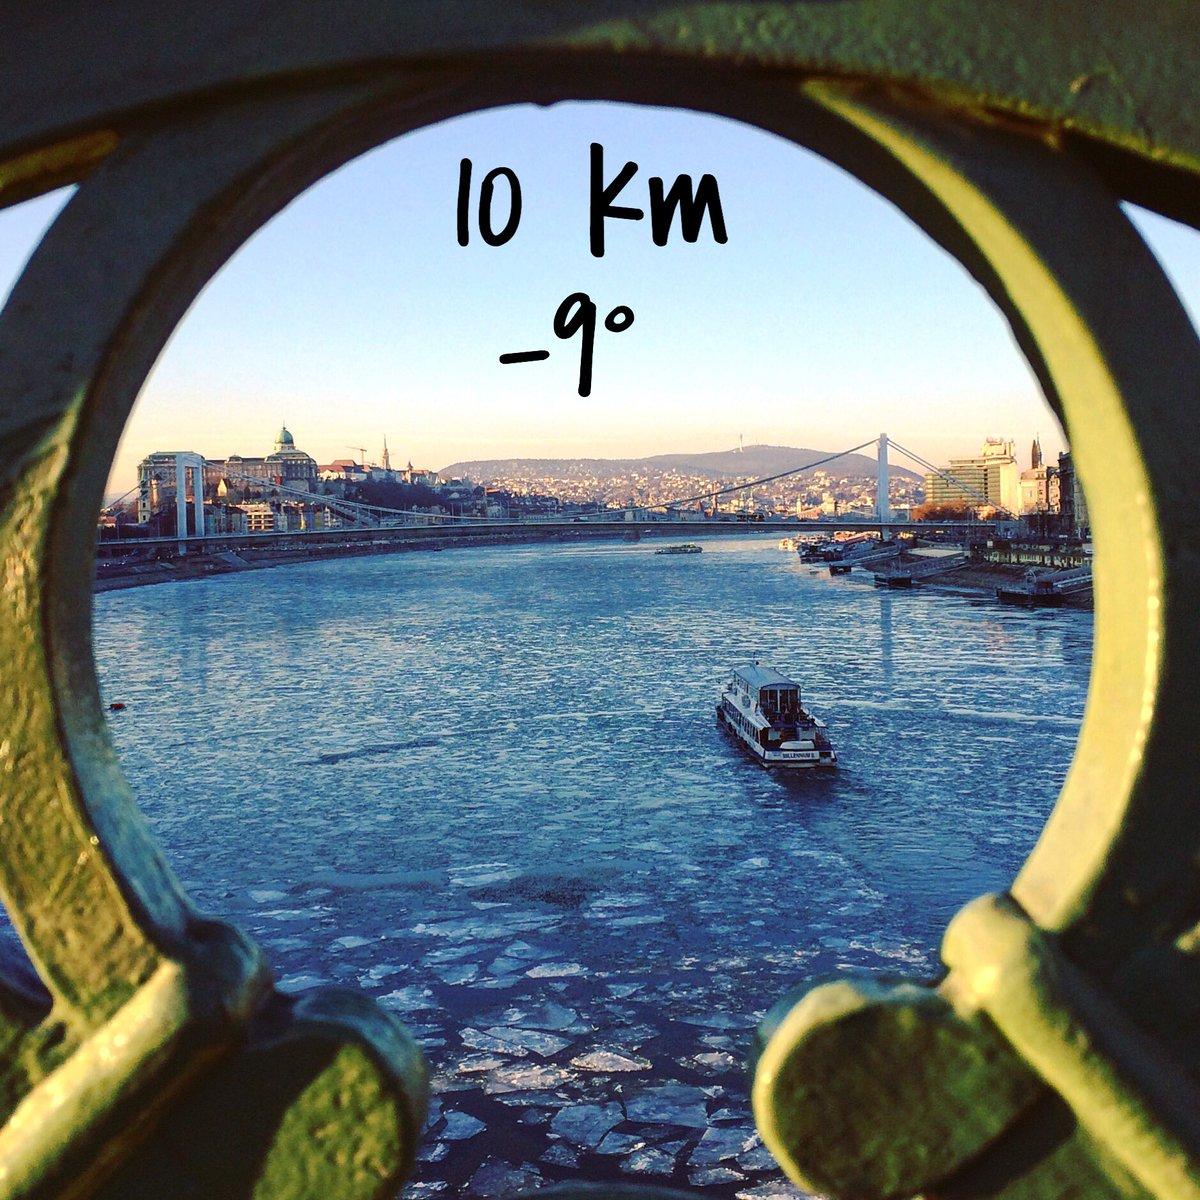 Aujourd&#39;hui, petit #run de 10km par -9° ️ #budapest #danube #courseapied #running #hiver<br>http://pic.twitter.com/jIbu9VwCwA